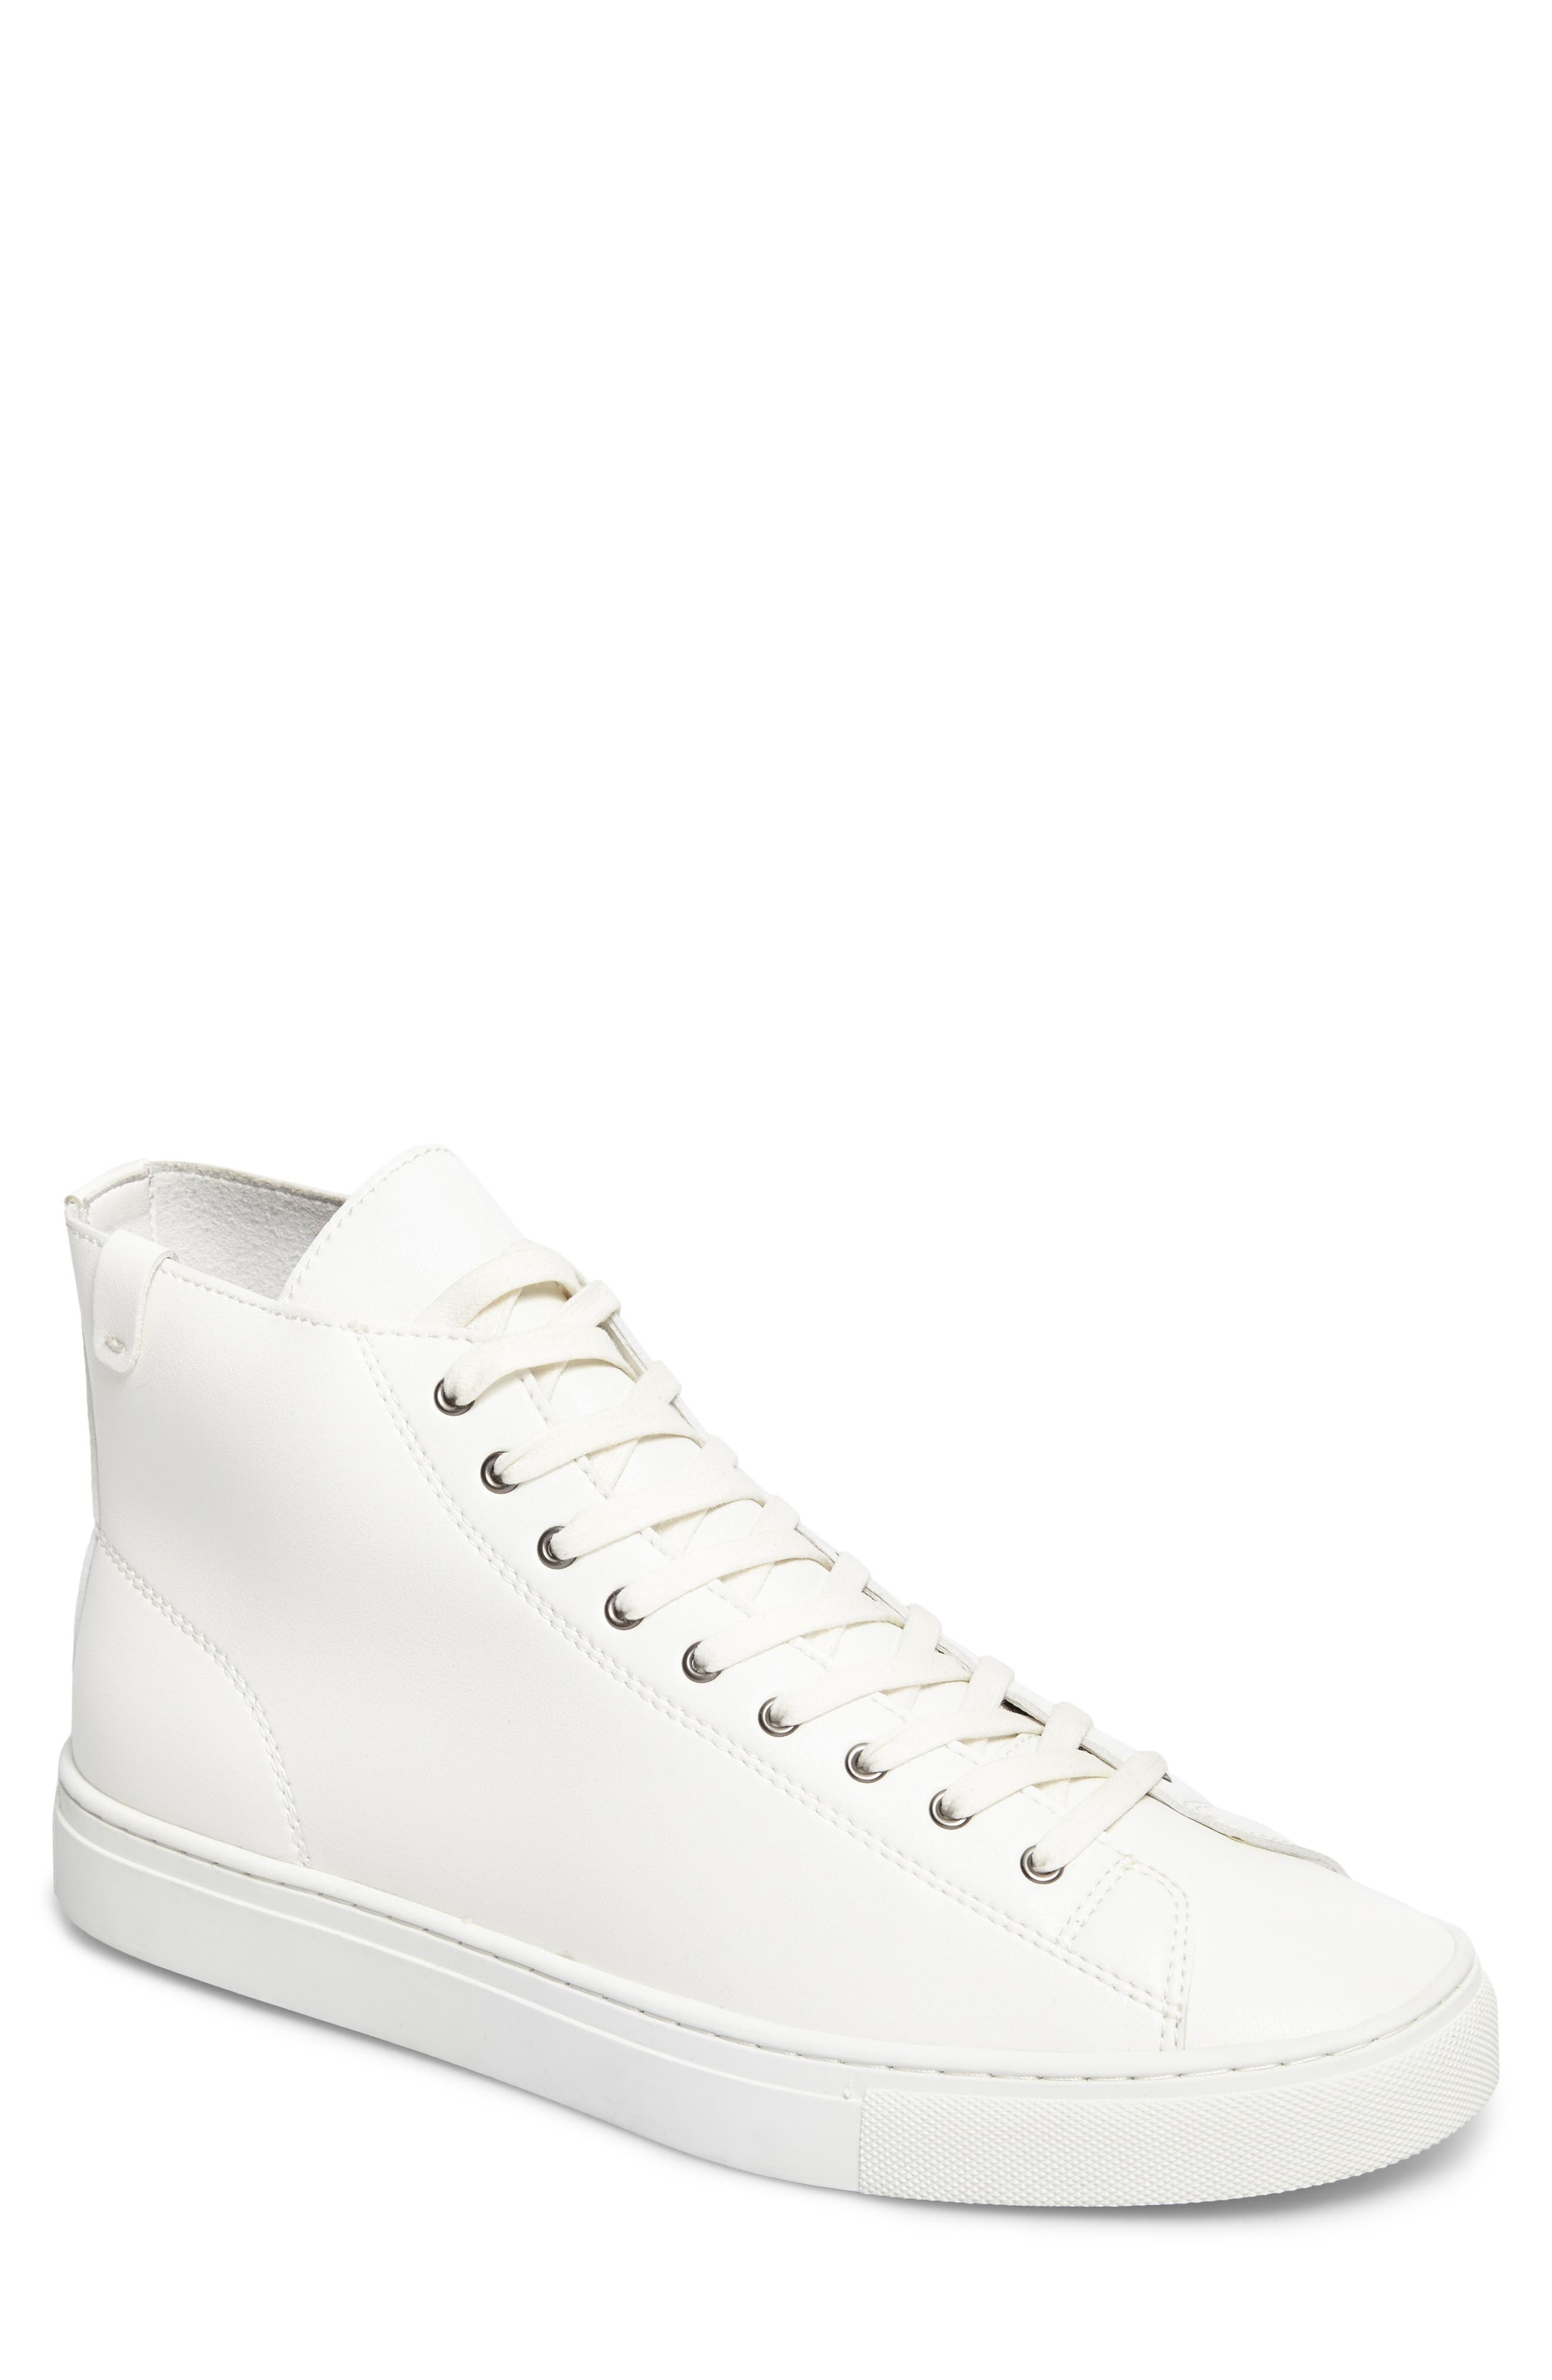 Original Sneaker,                             Main thumbnail 1, color,                             White